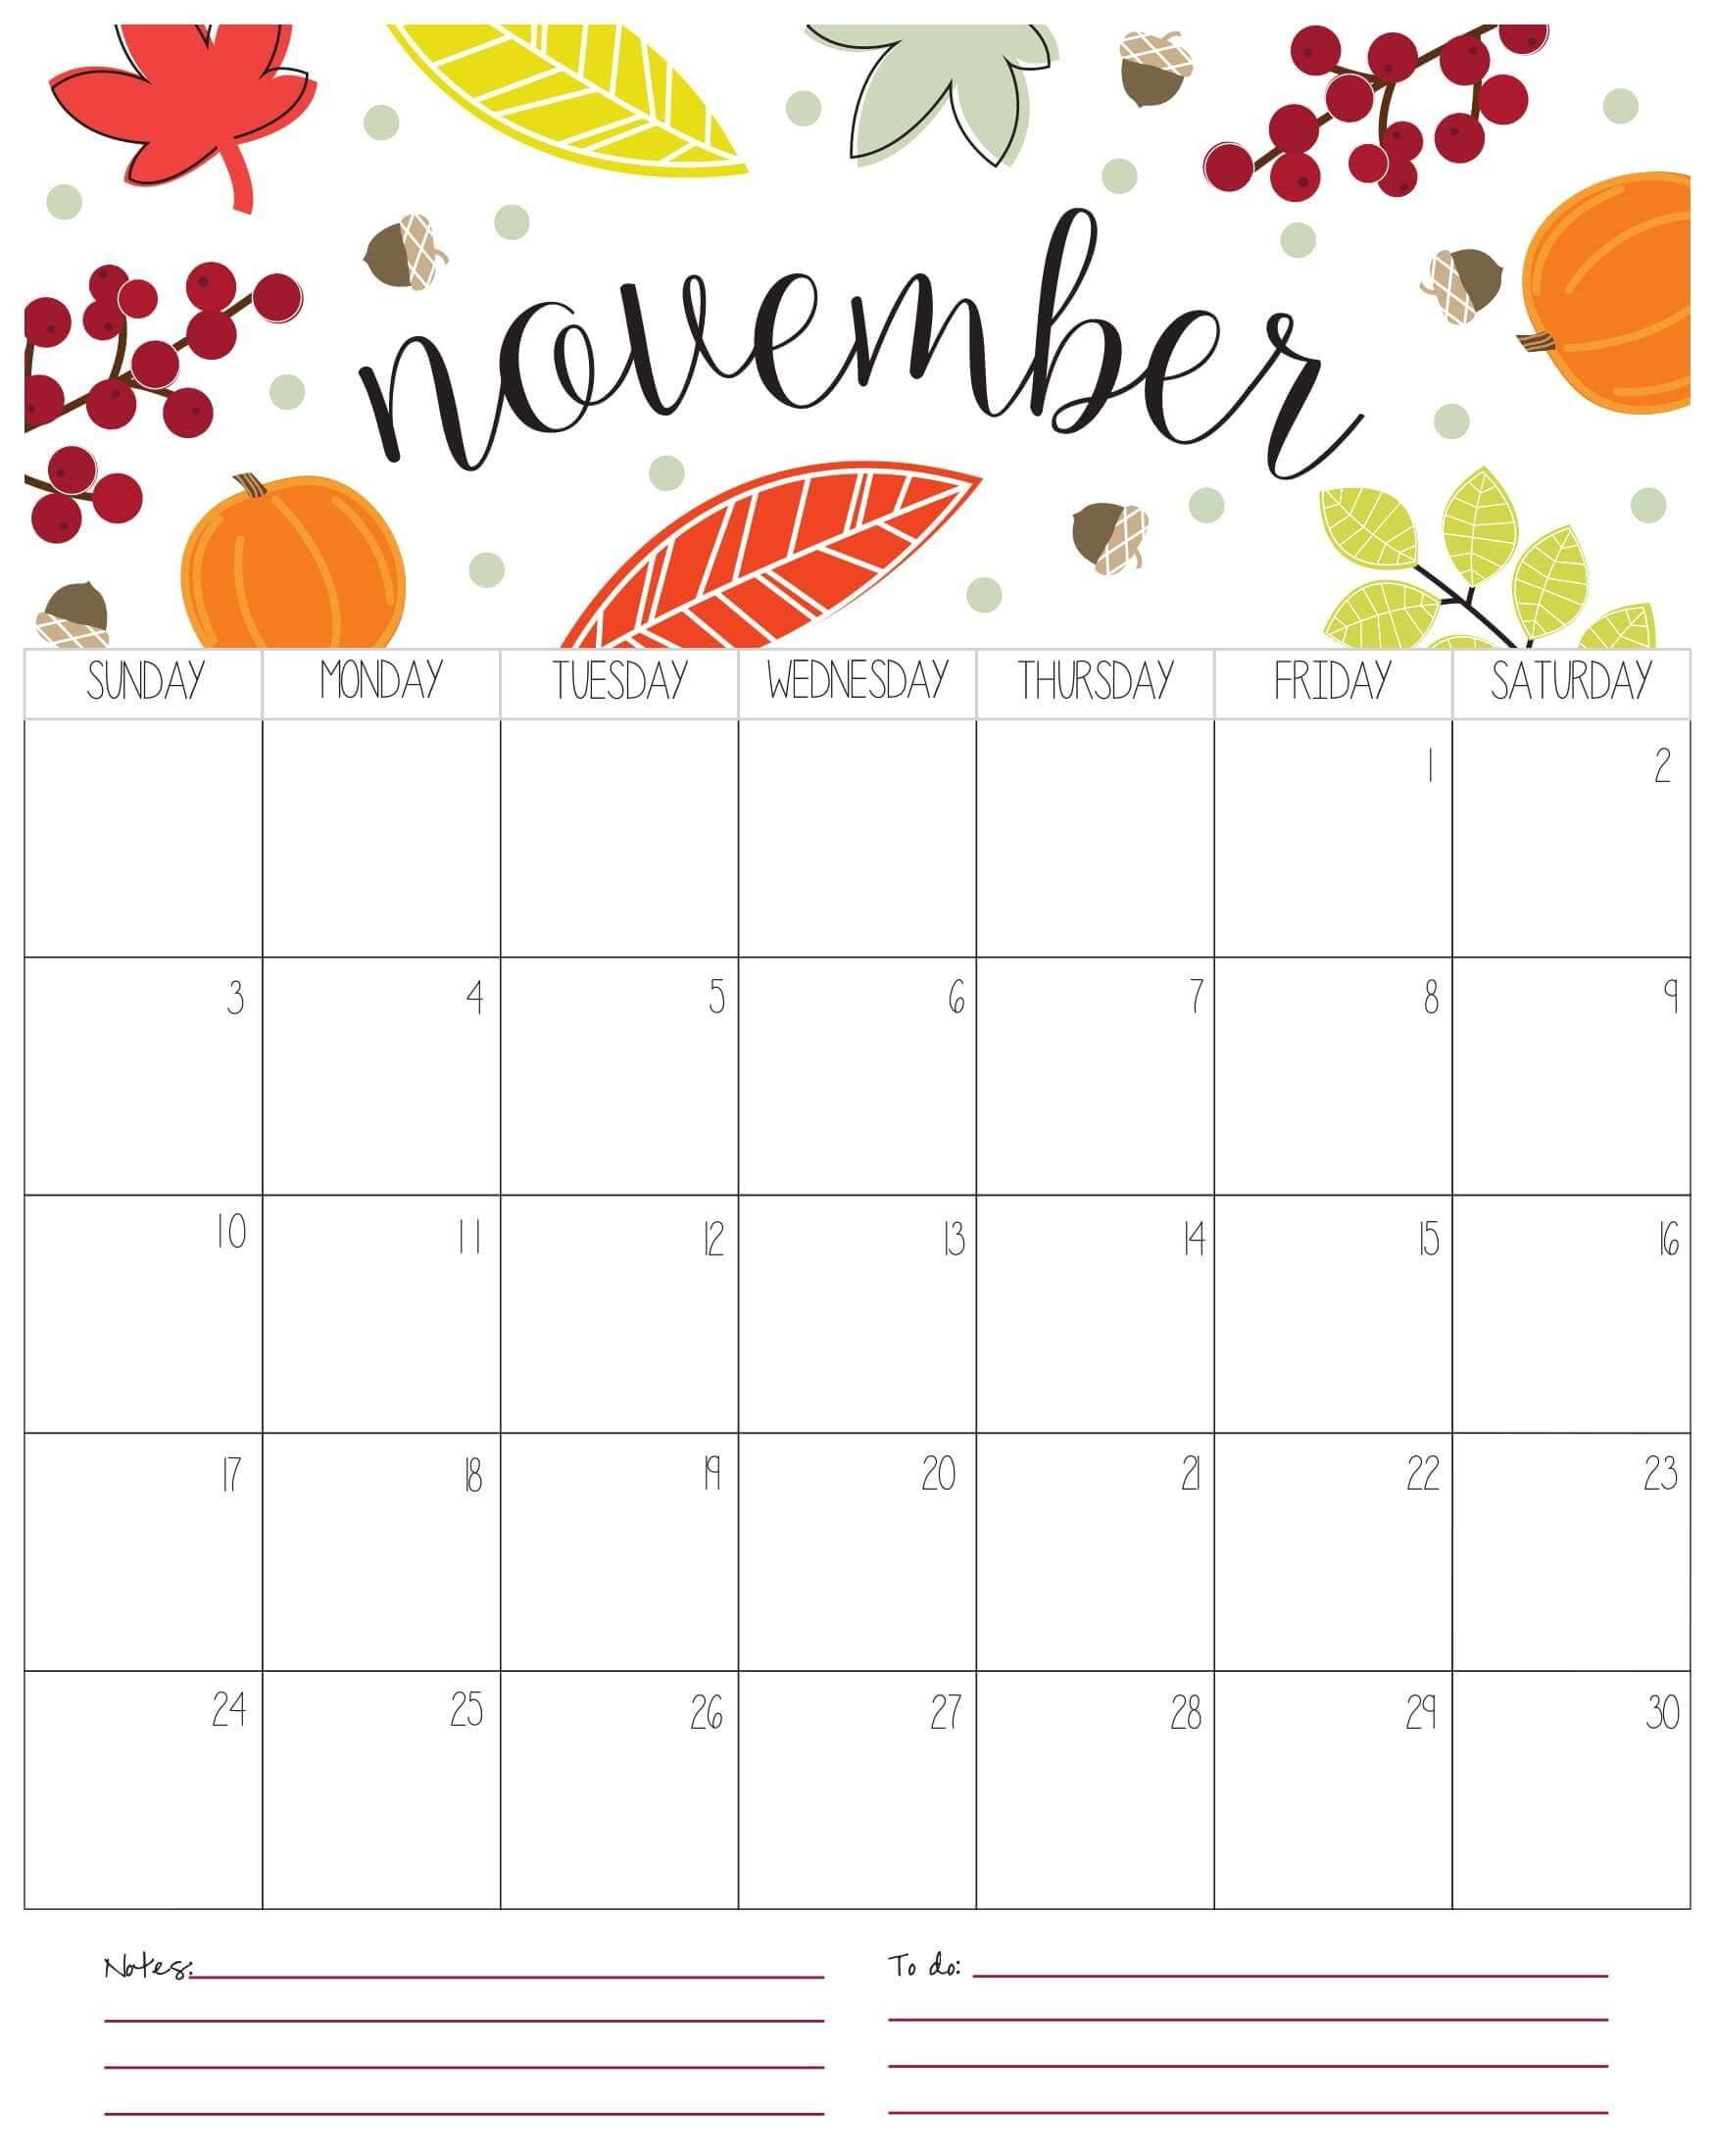 November 2019 Floral Wallpaper